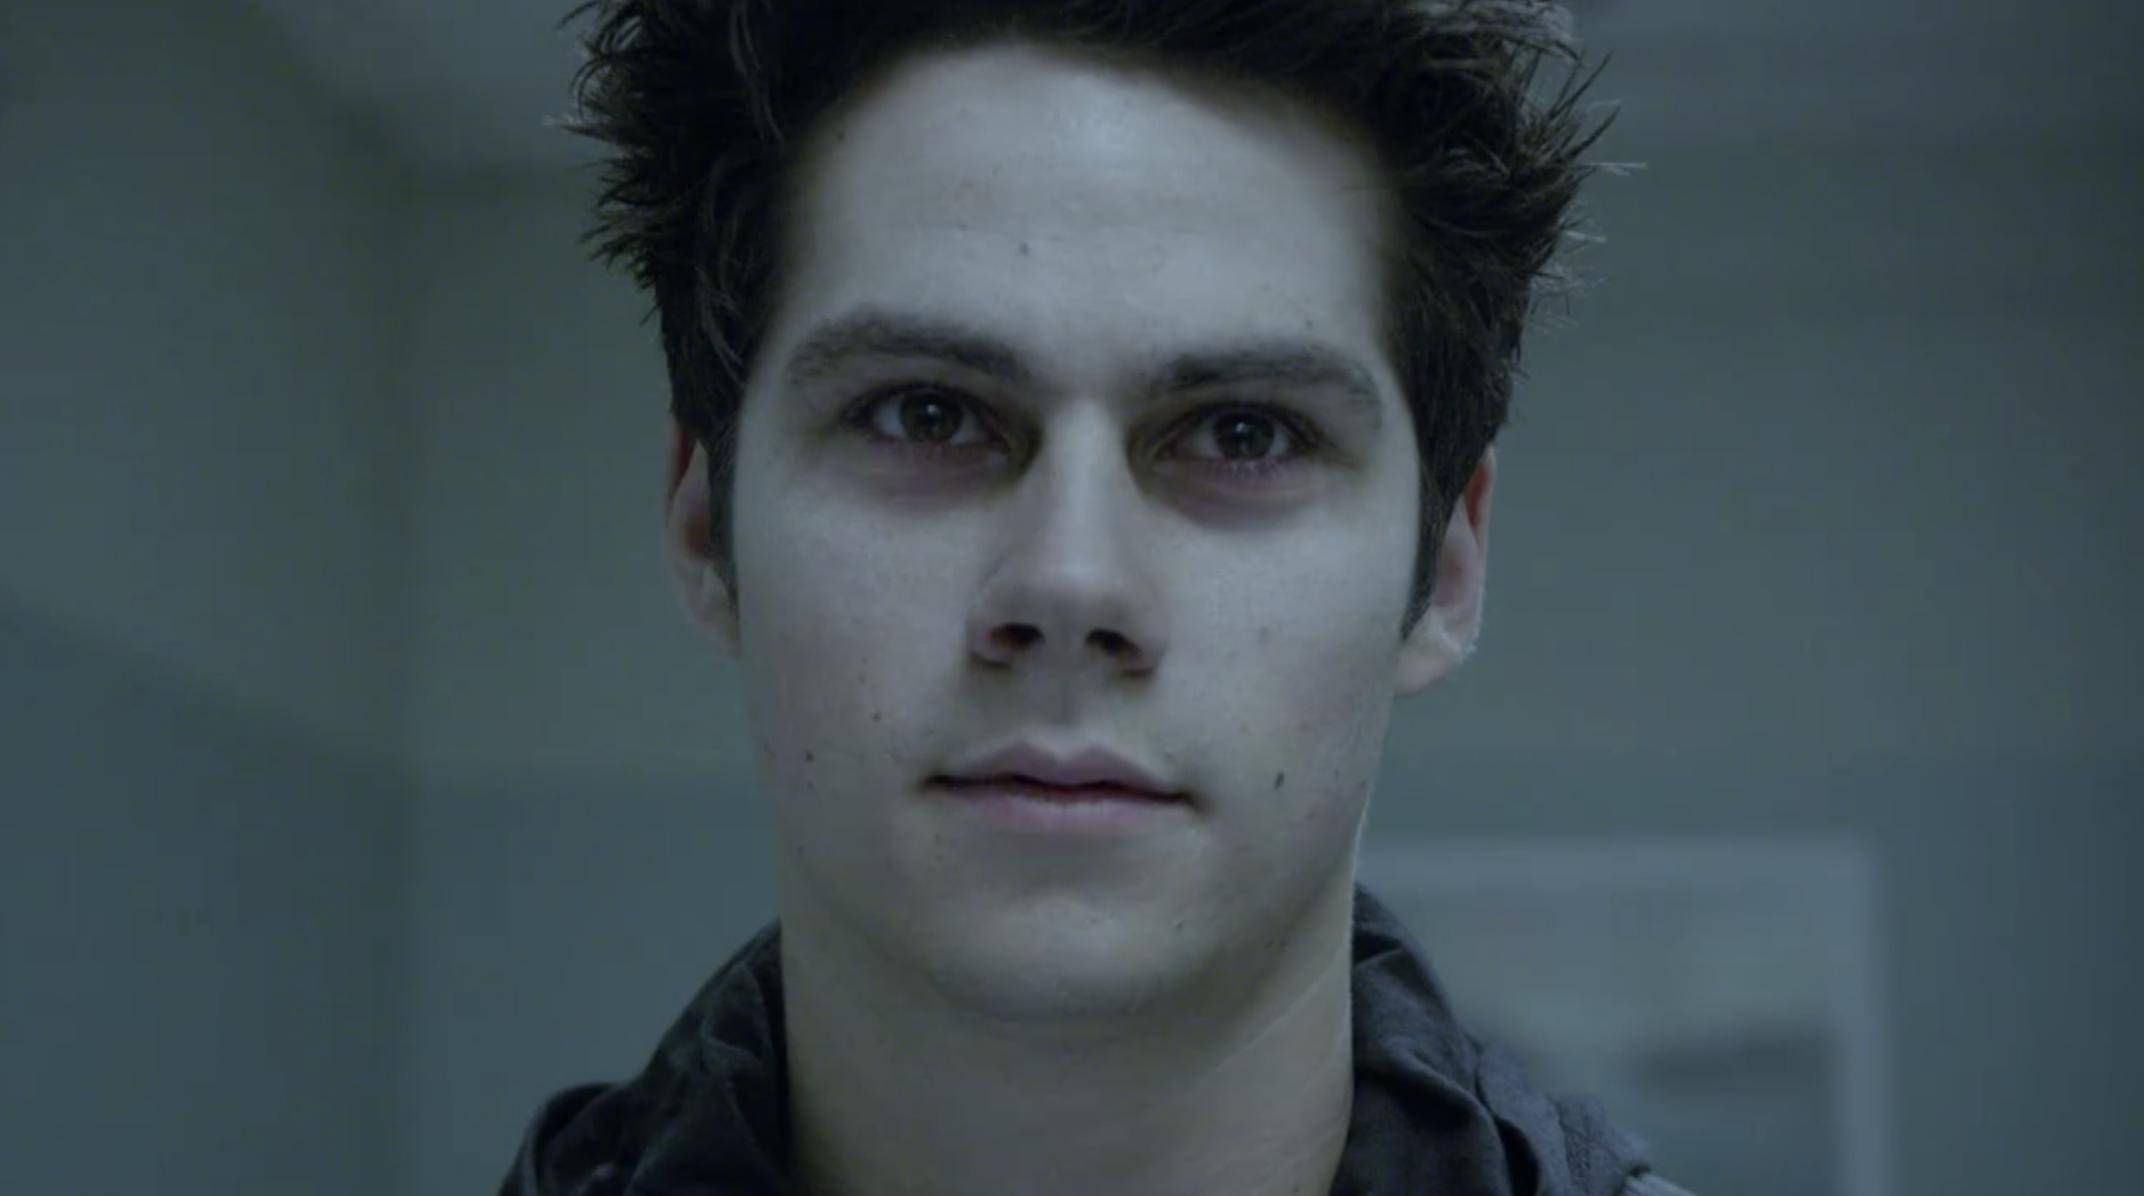 Void Stiles looking menacing in the hospital hall